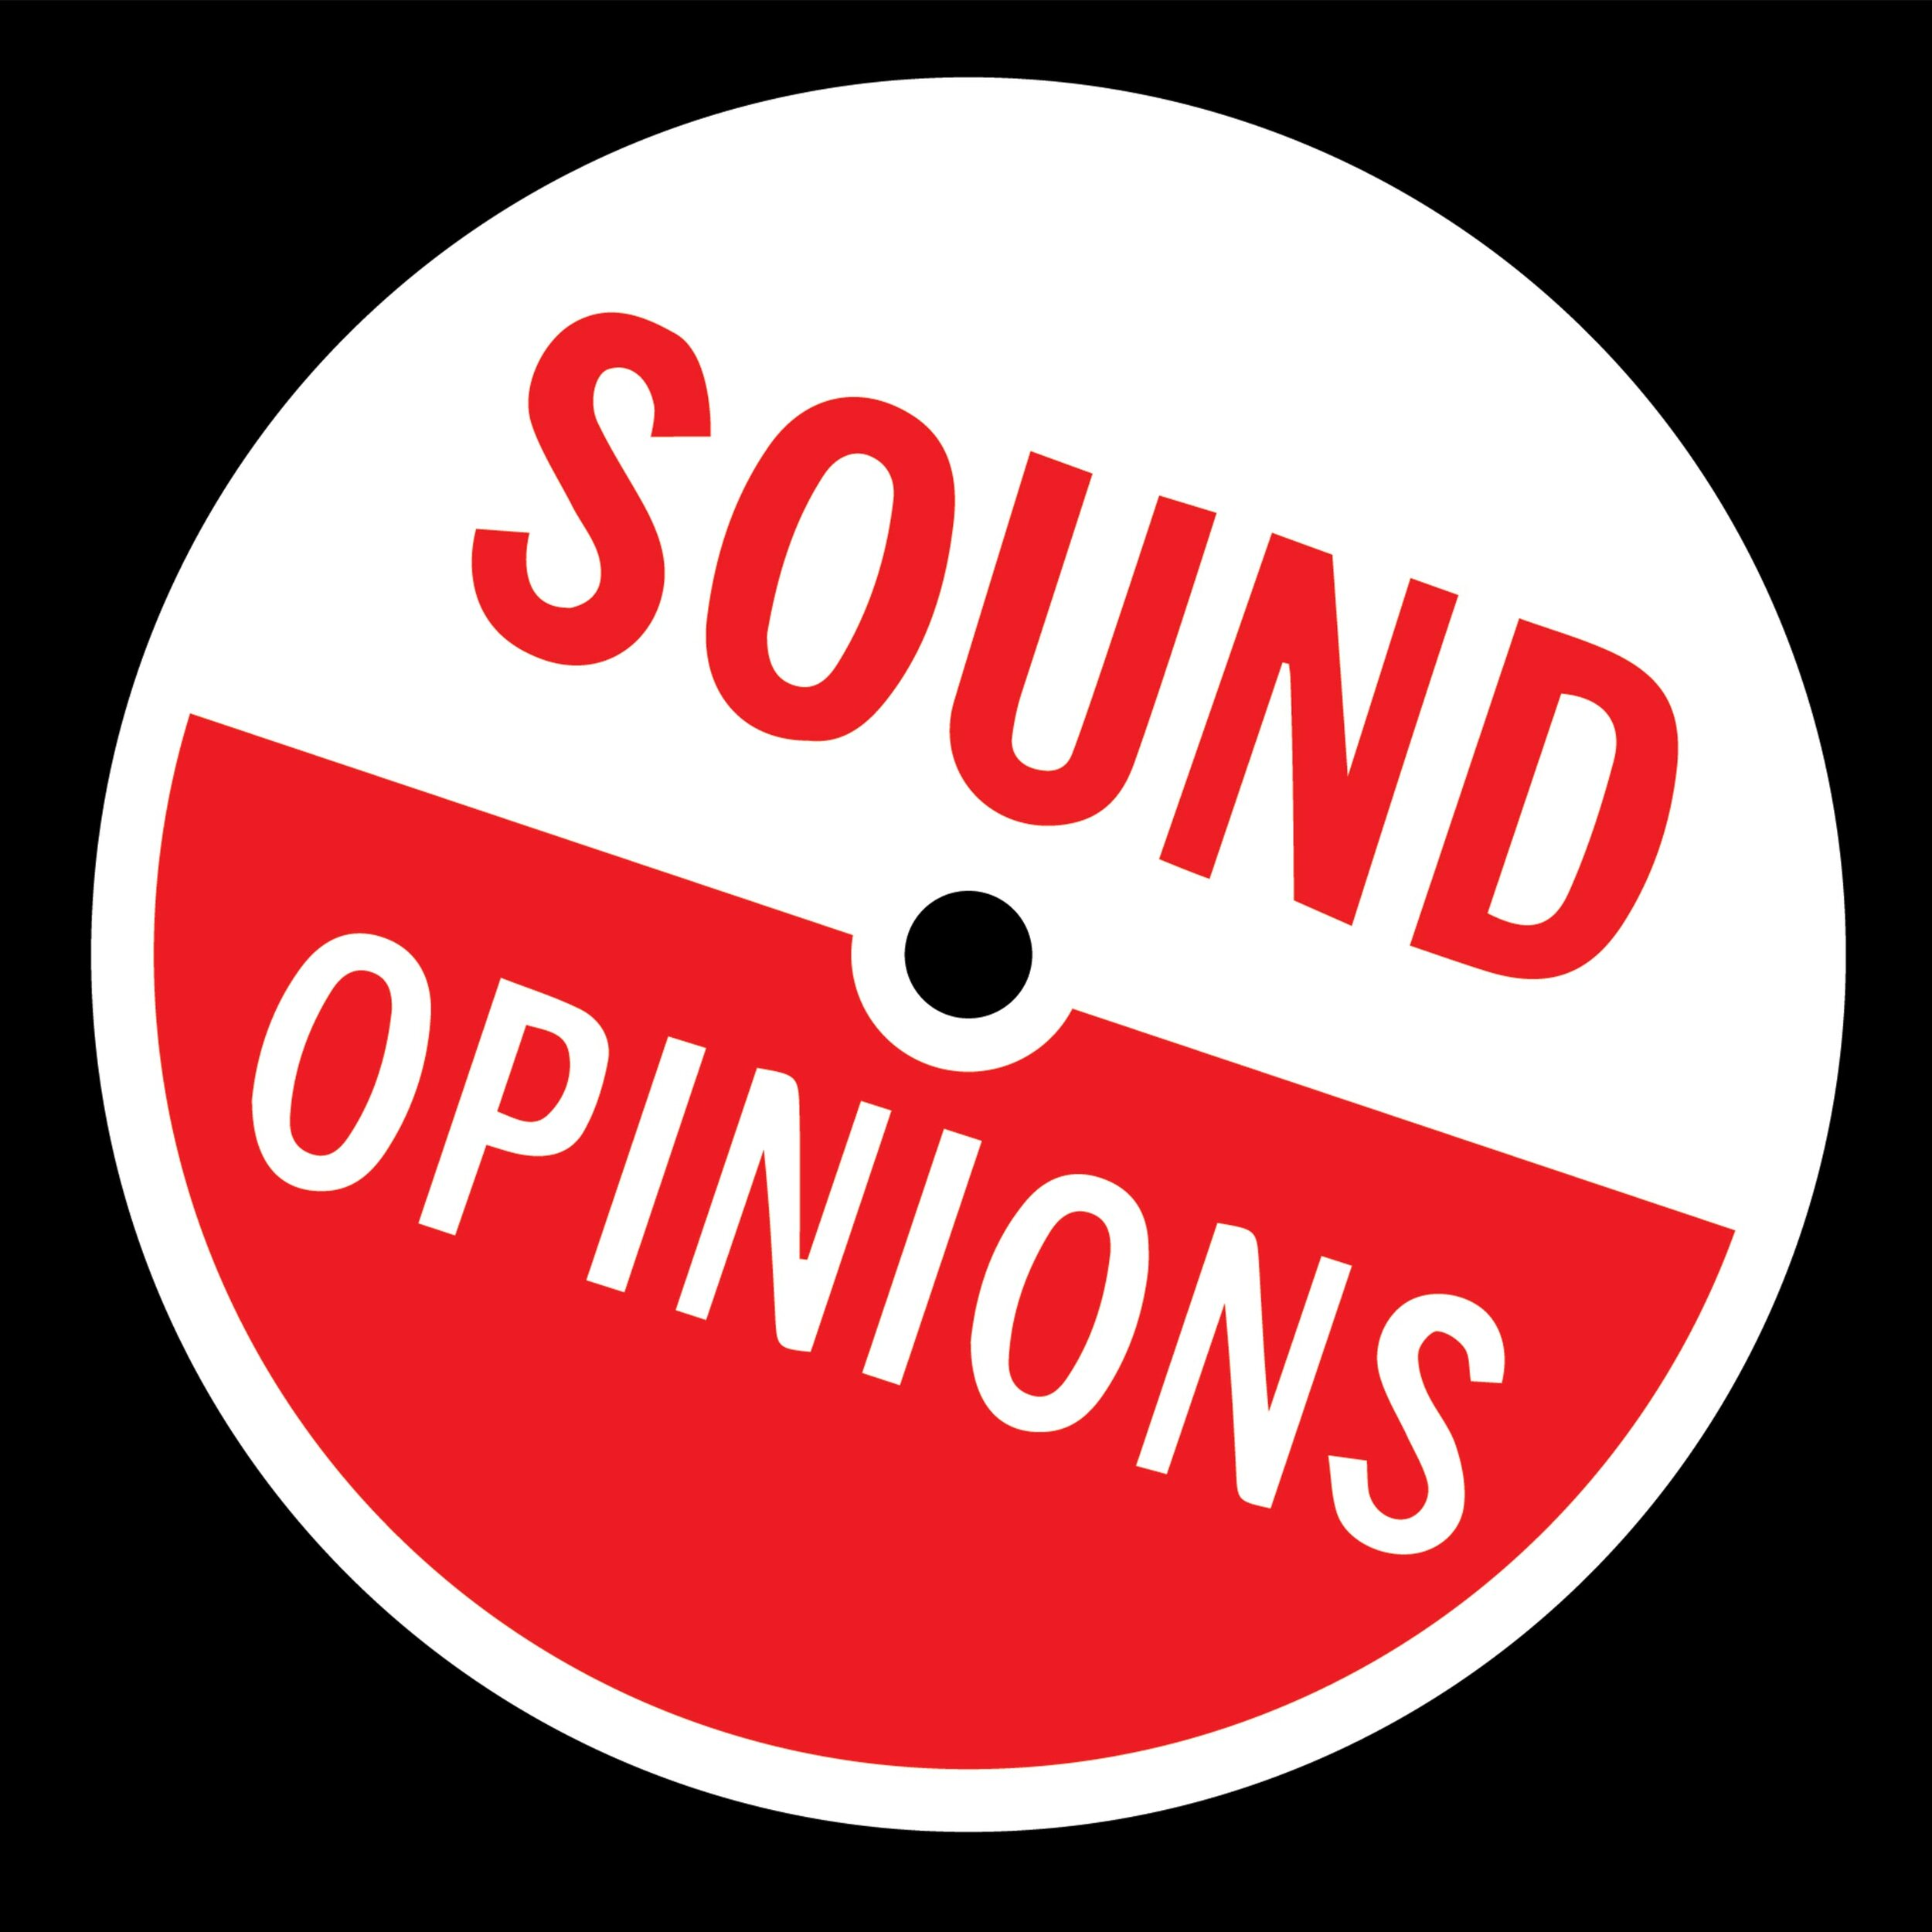 soundopinions_podcast_logo.jpeg